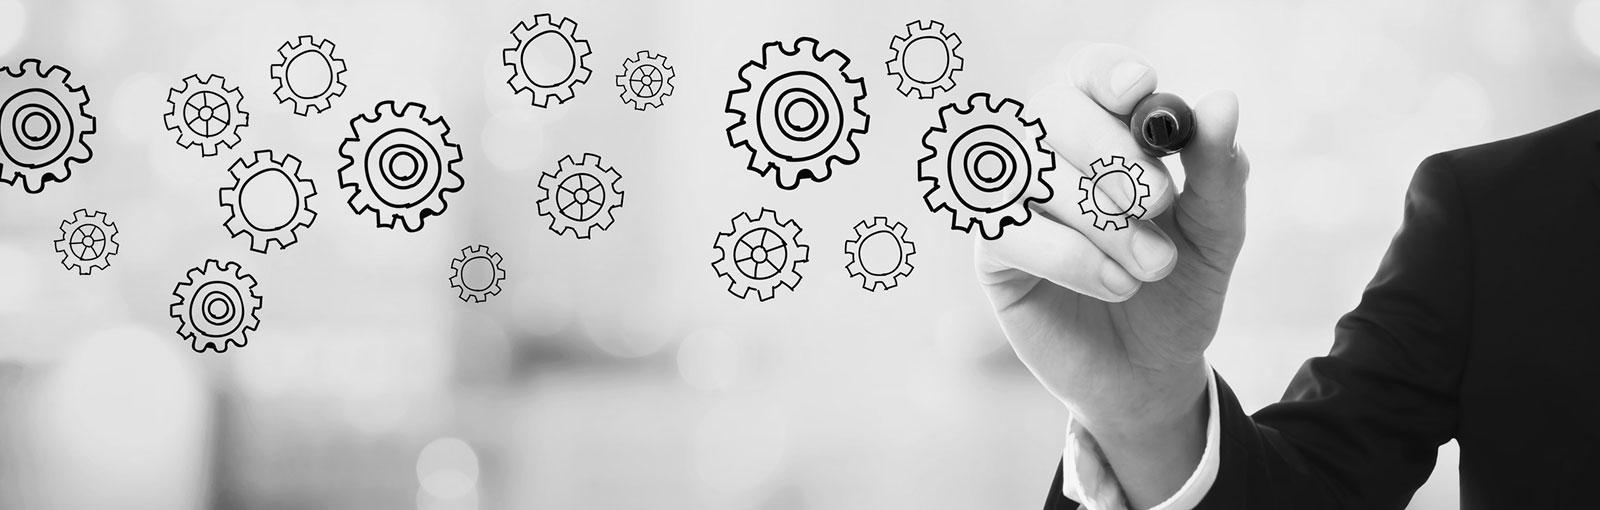 Value Automation IT Services